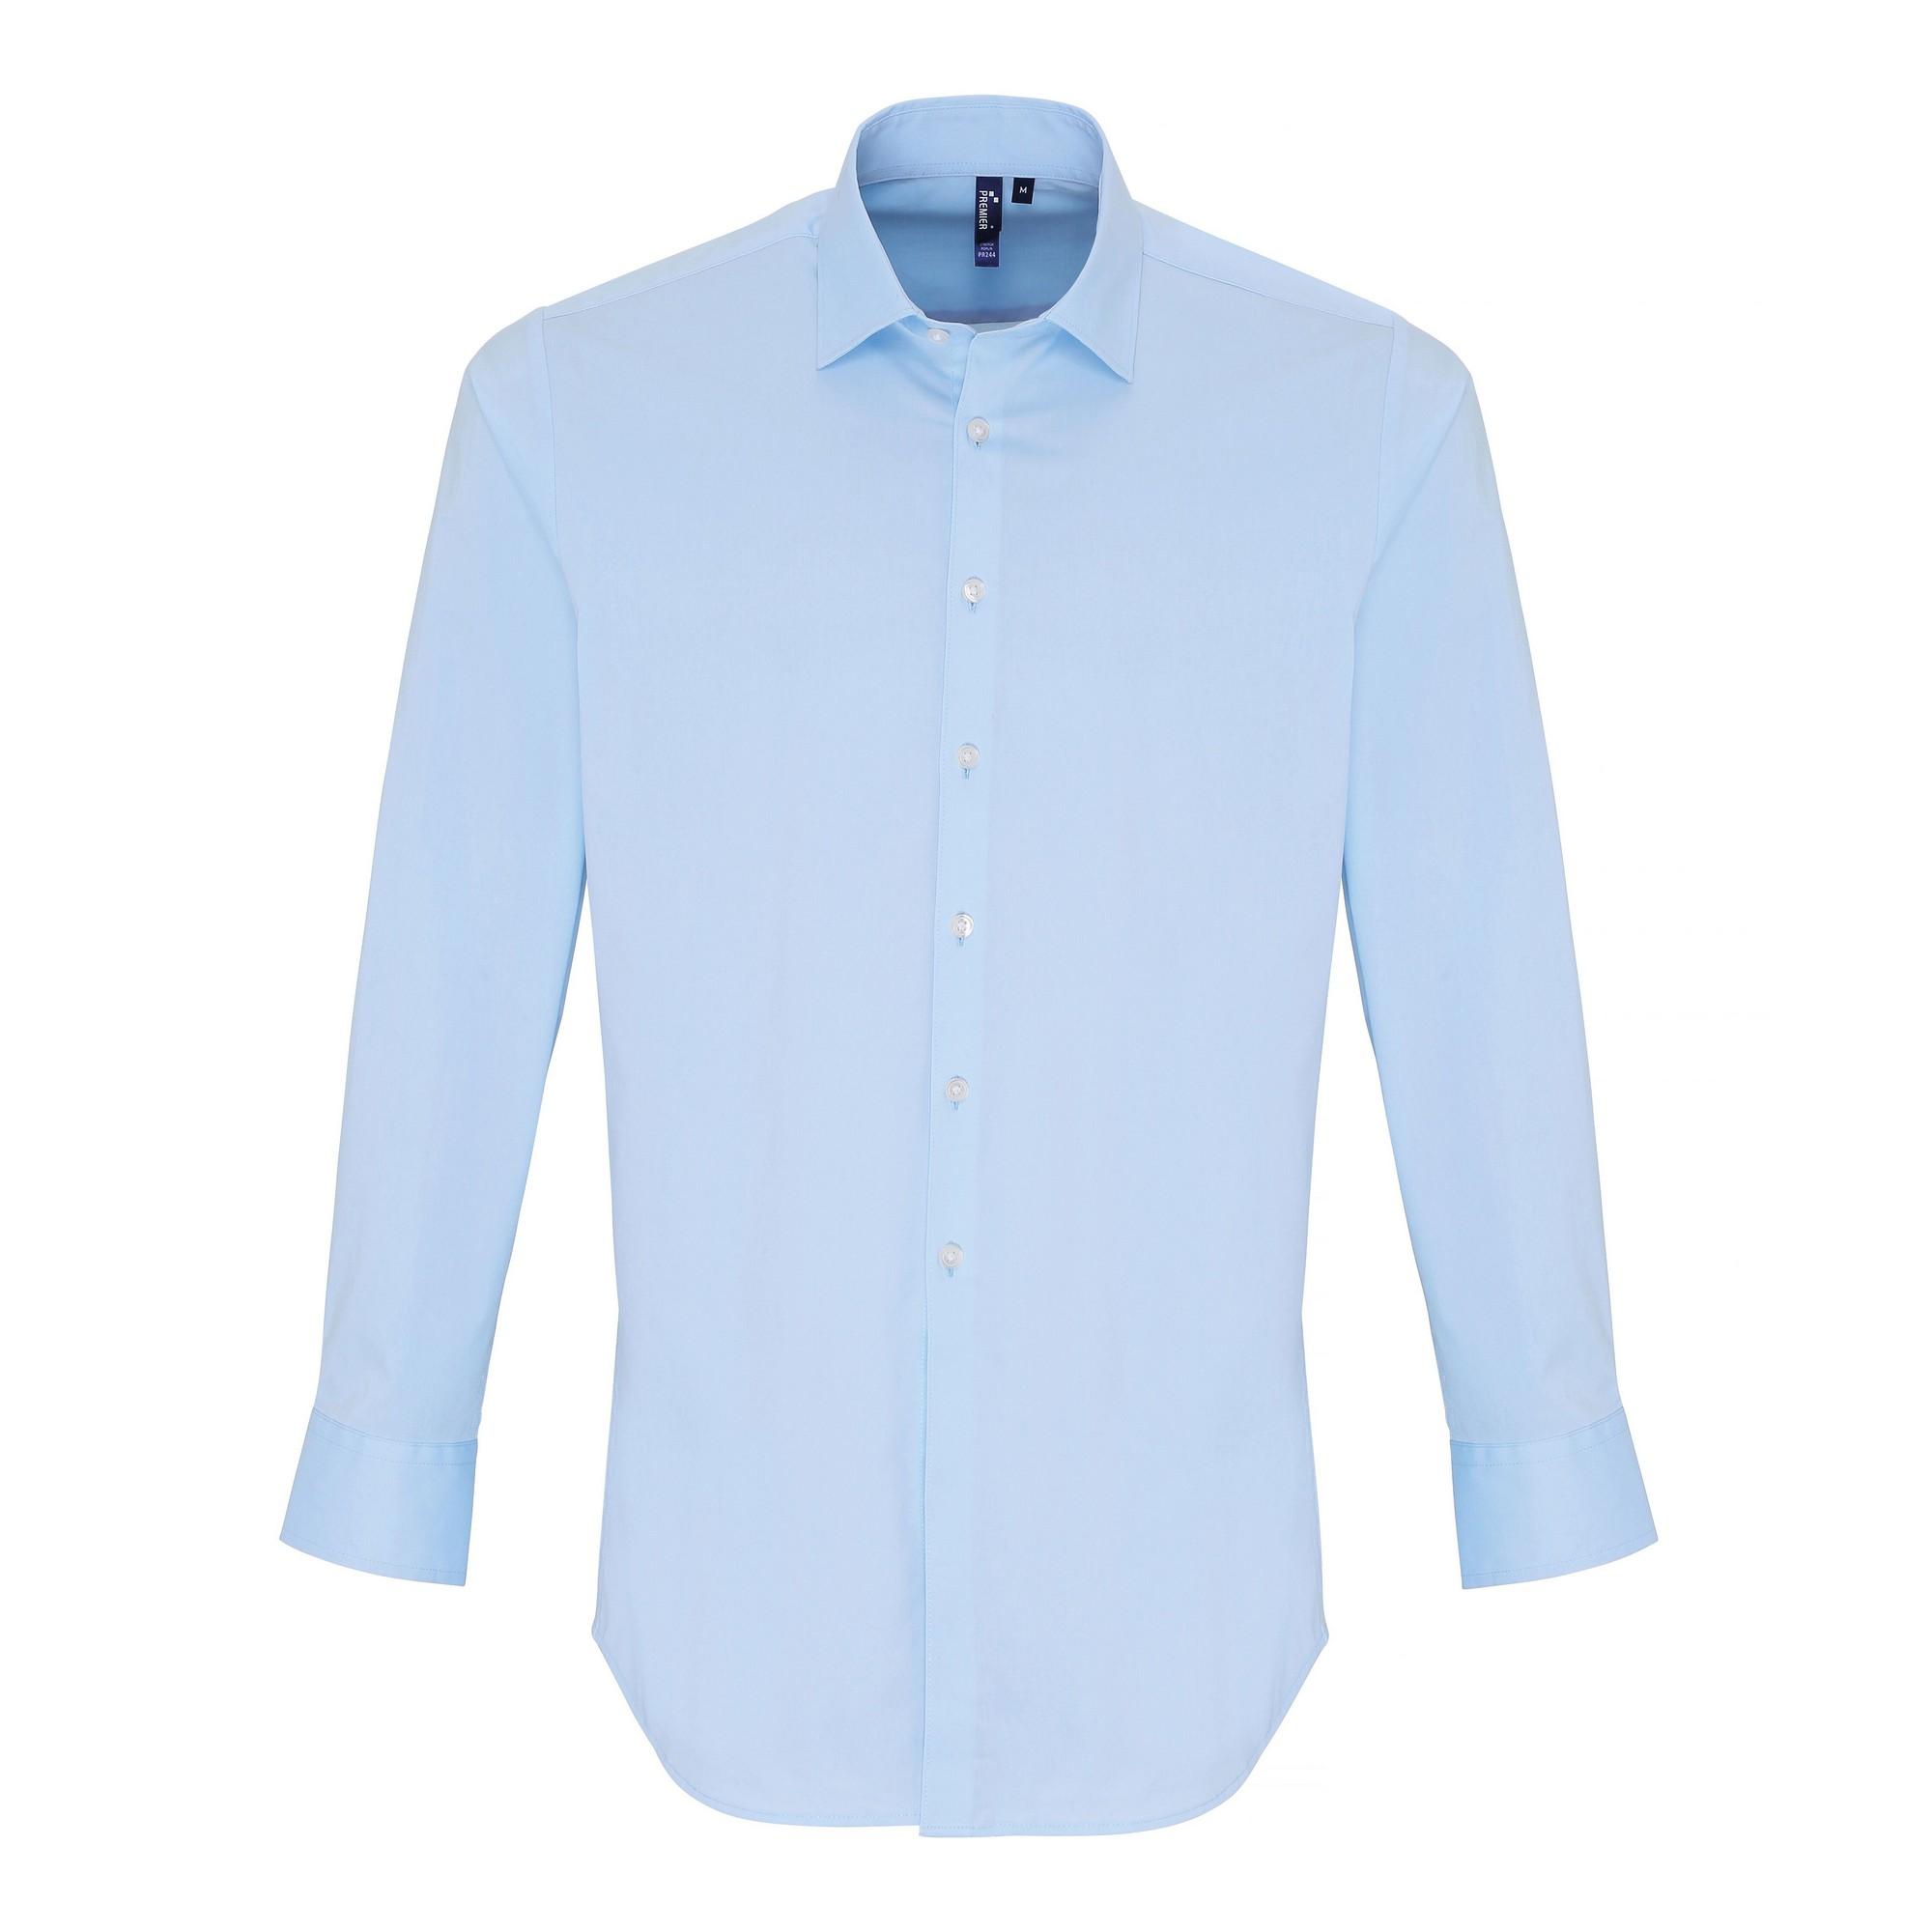 Premier Mens Stretch Fit Poplin Long Sleeve Shirt (2XL) (Pale Blue)